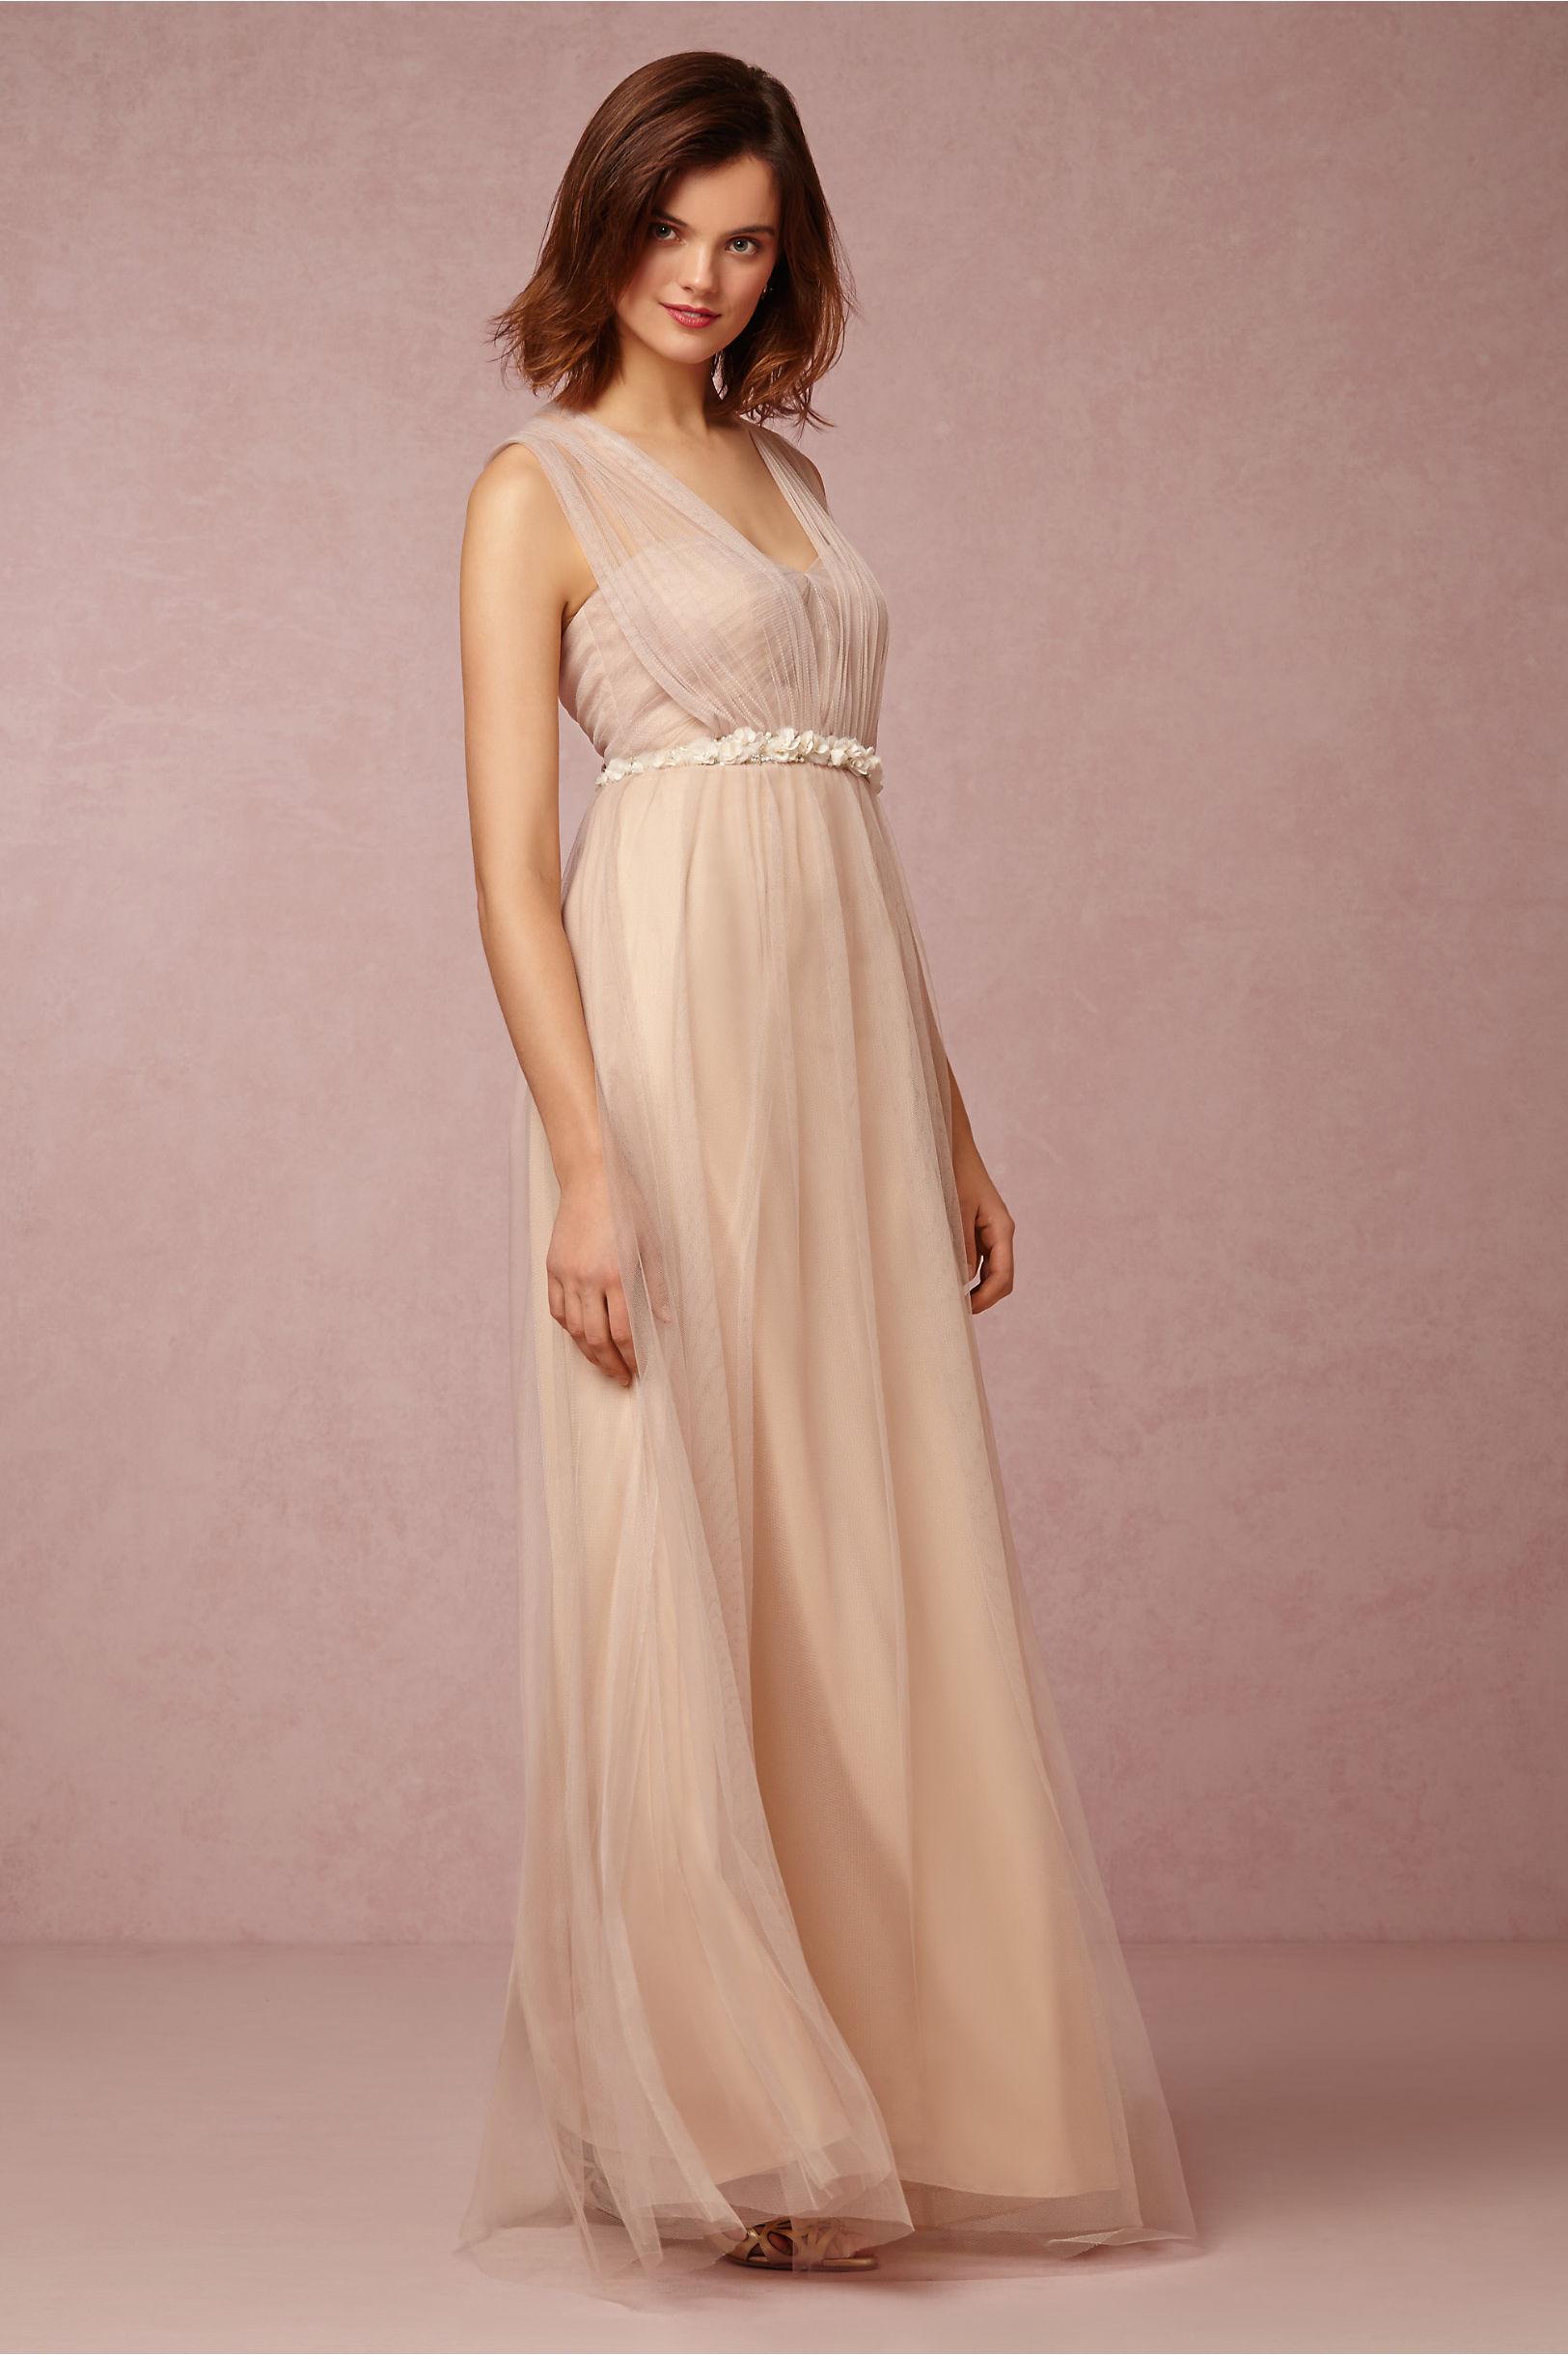 Champagne teenage bridesmaid dresses uk flower girl dresses champagne teenage bridesmaid dresses uk 52 ombrellifo Gallery